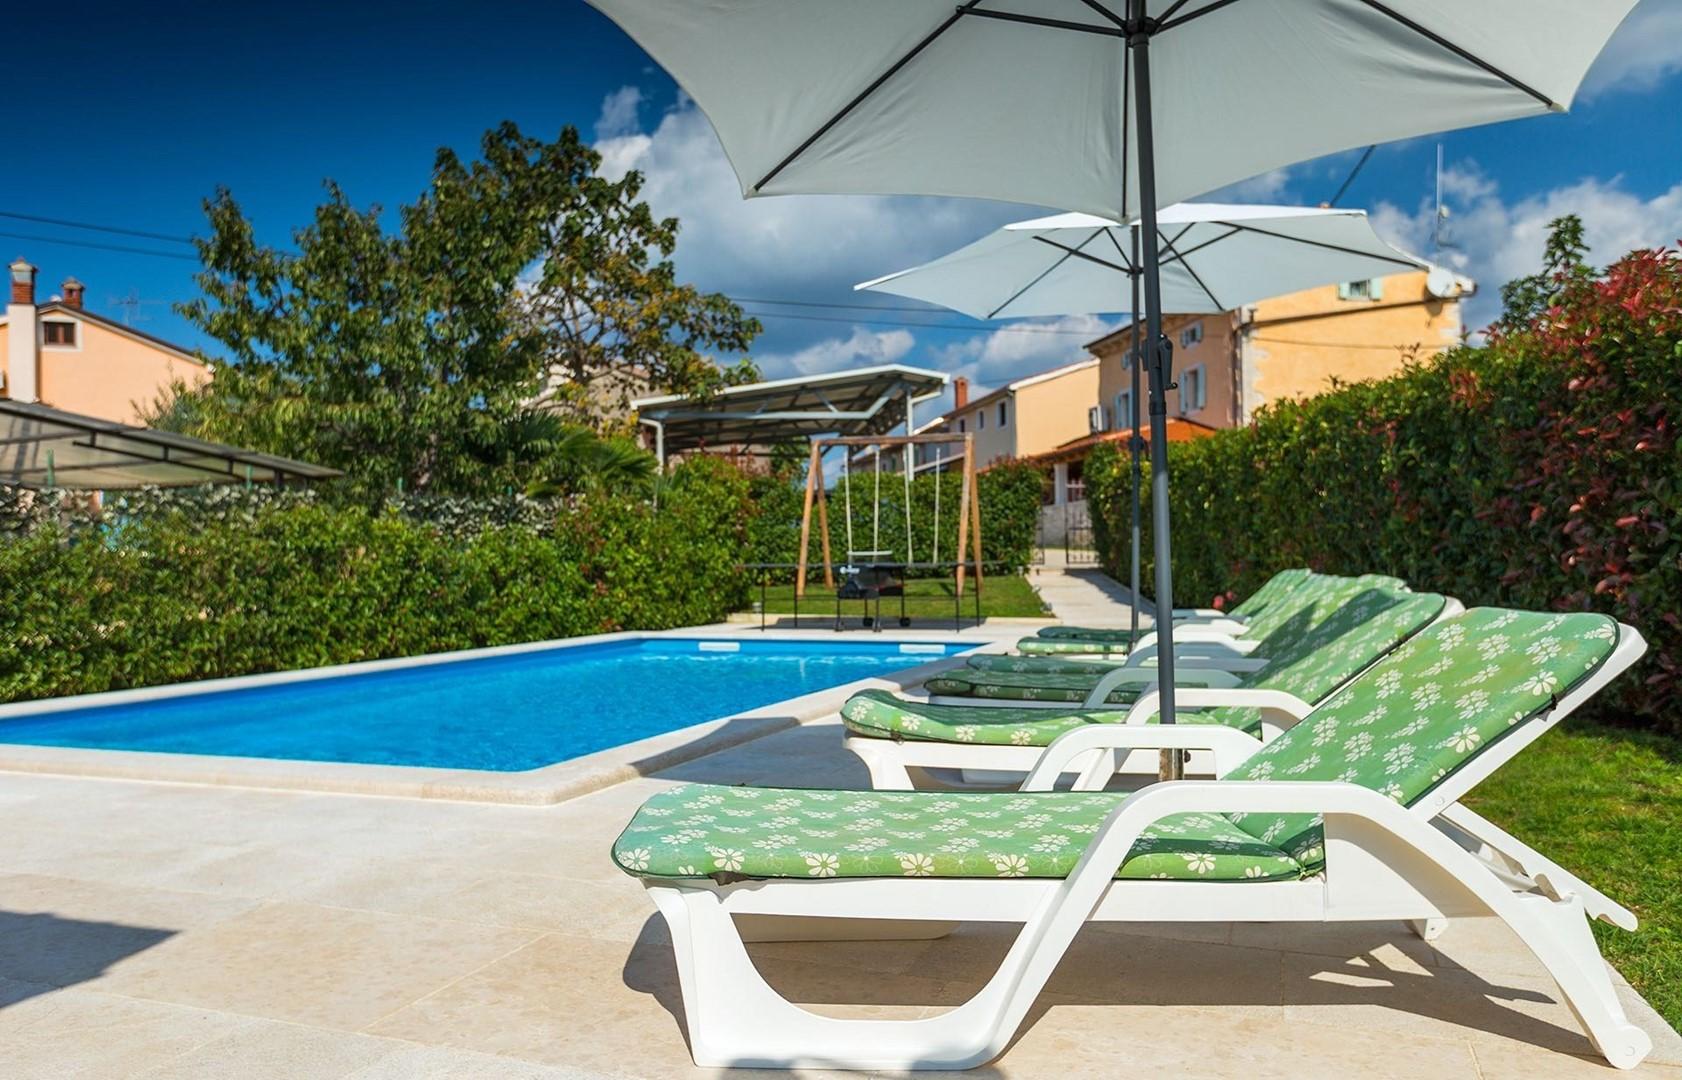 Ferienhaus Villa Bubani / private pool (860332), Kanfanar, , Istrien, Kroatien, Bild 4